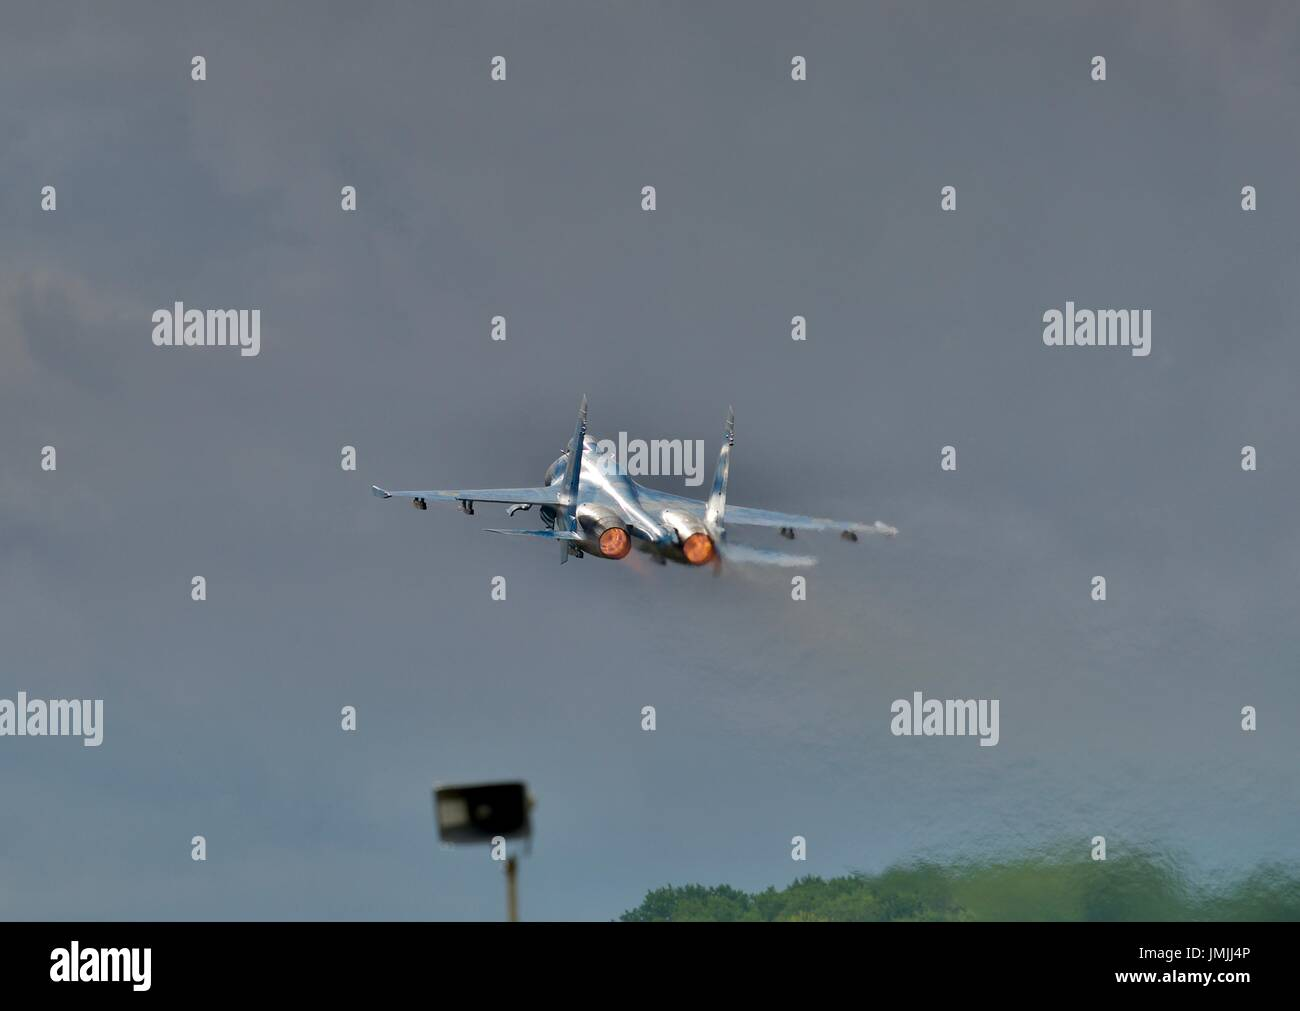 Su-27 Flanker fighter jet - Stock Image